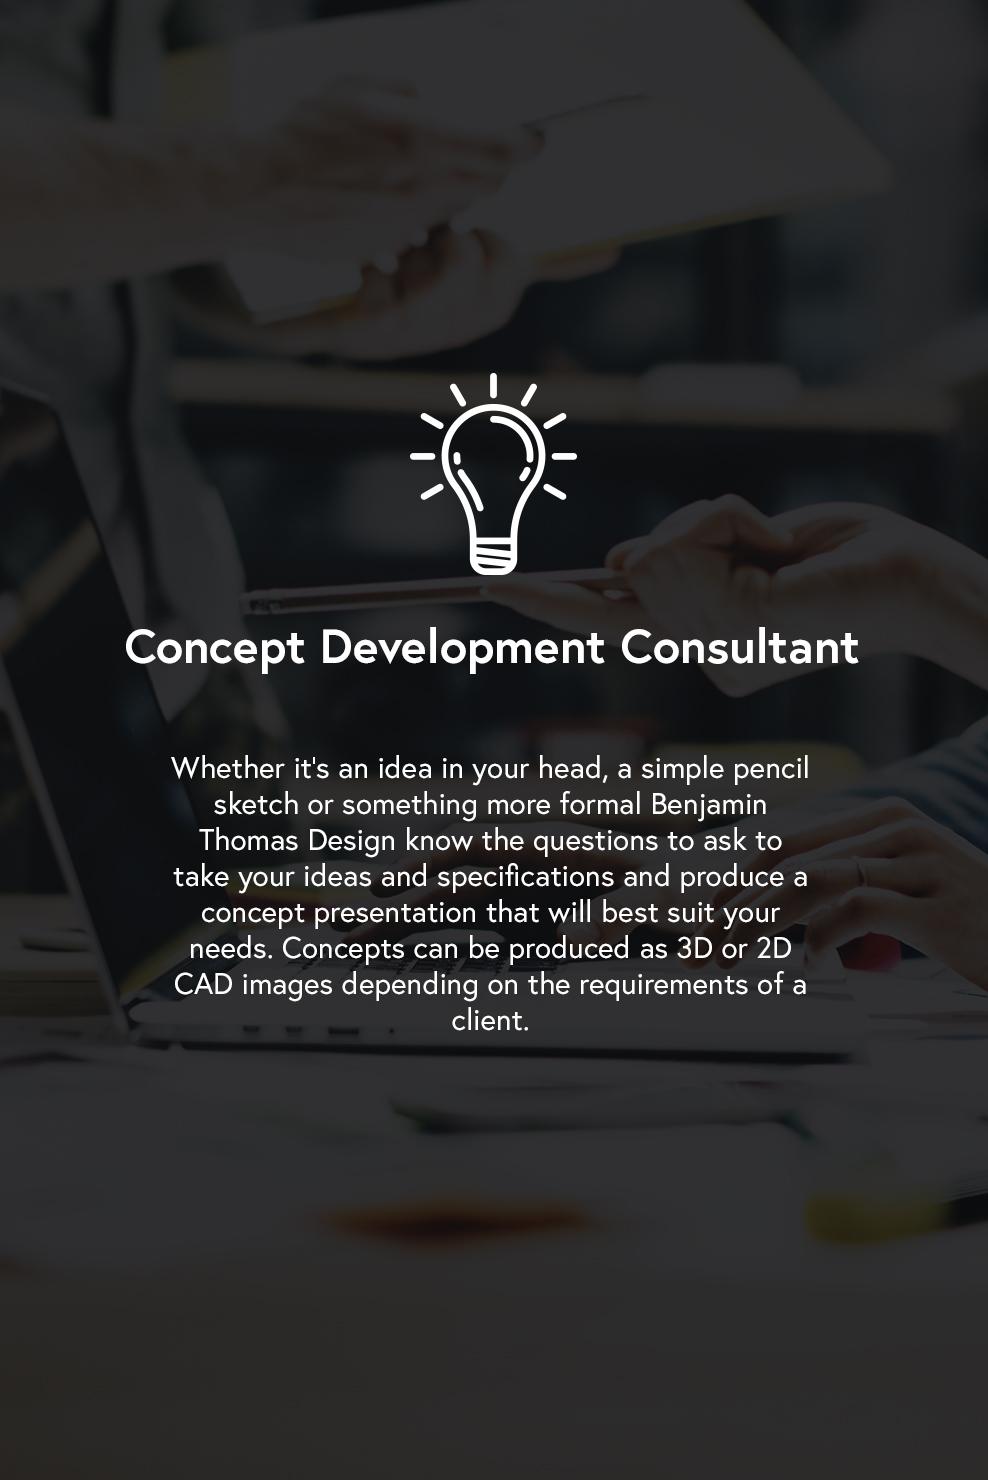 concept-development-consultant.jpg